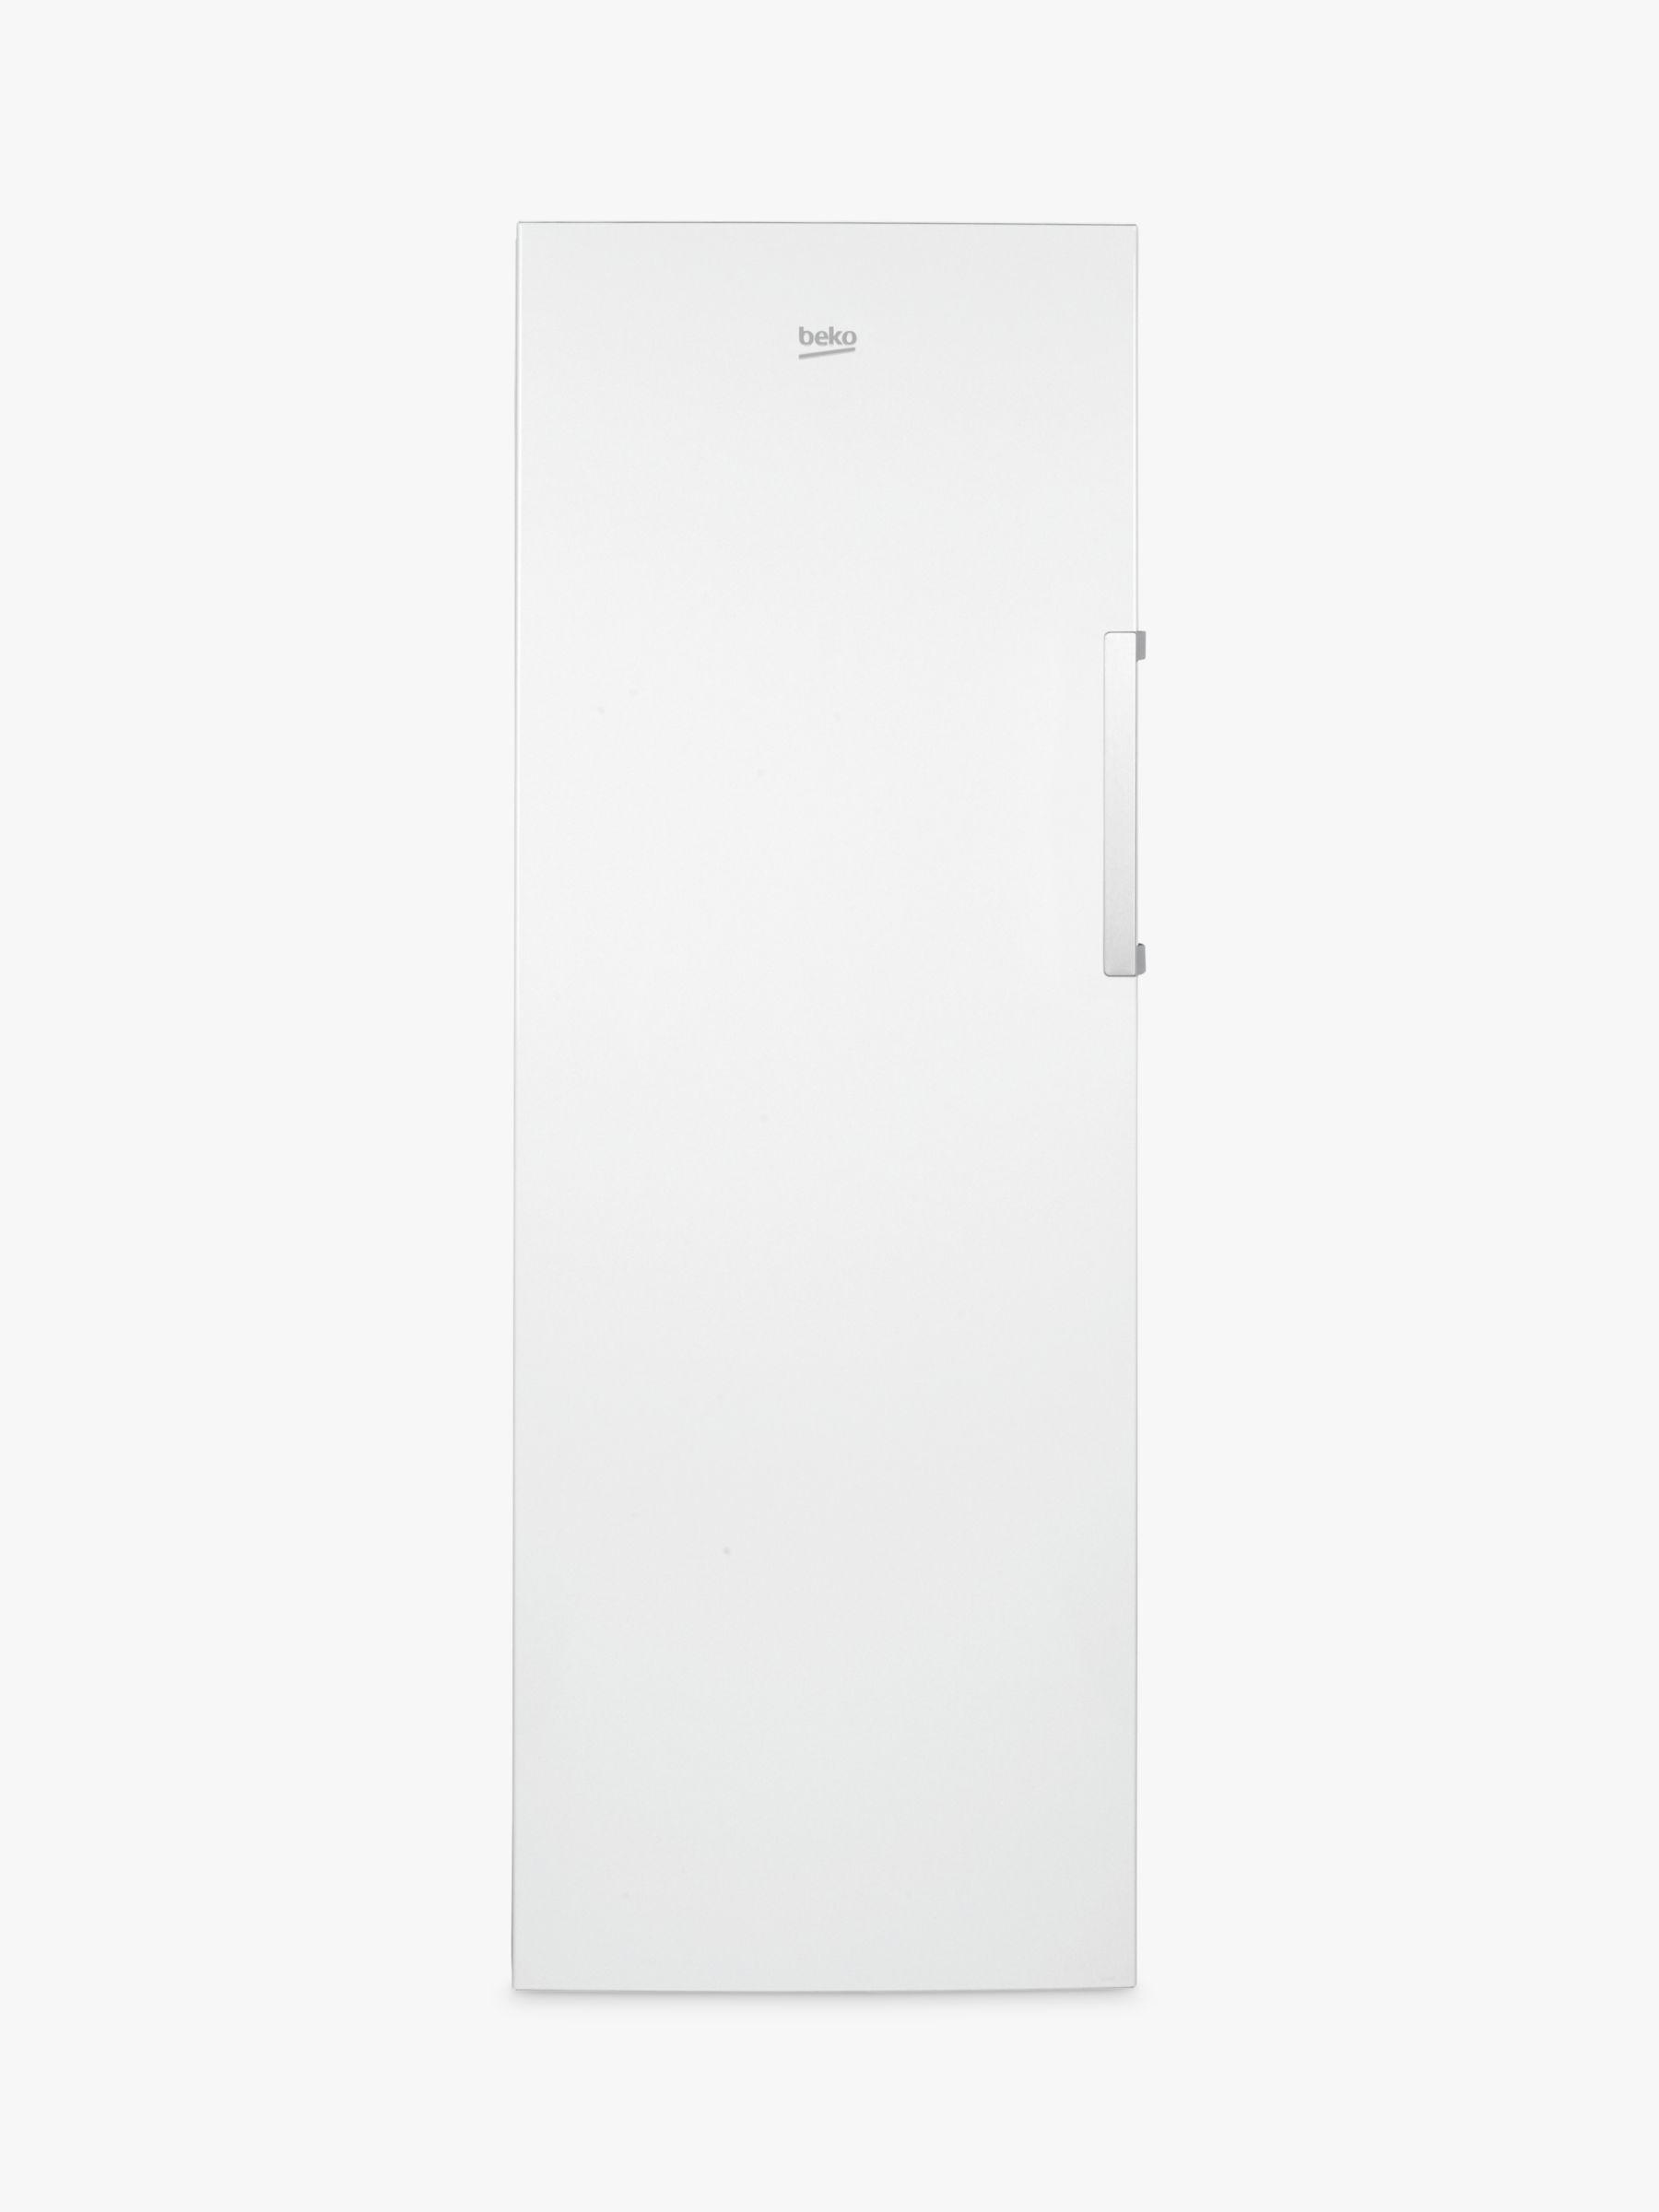 Beko Beko FFP1671W Tall Freezer, A+ Energy Rating, 60cm Wide, White